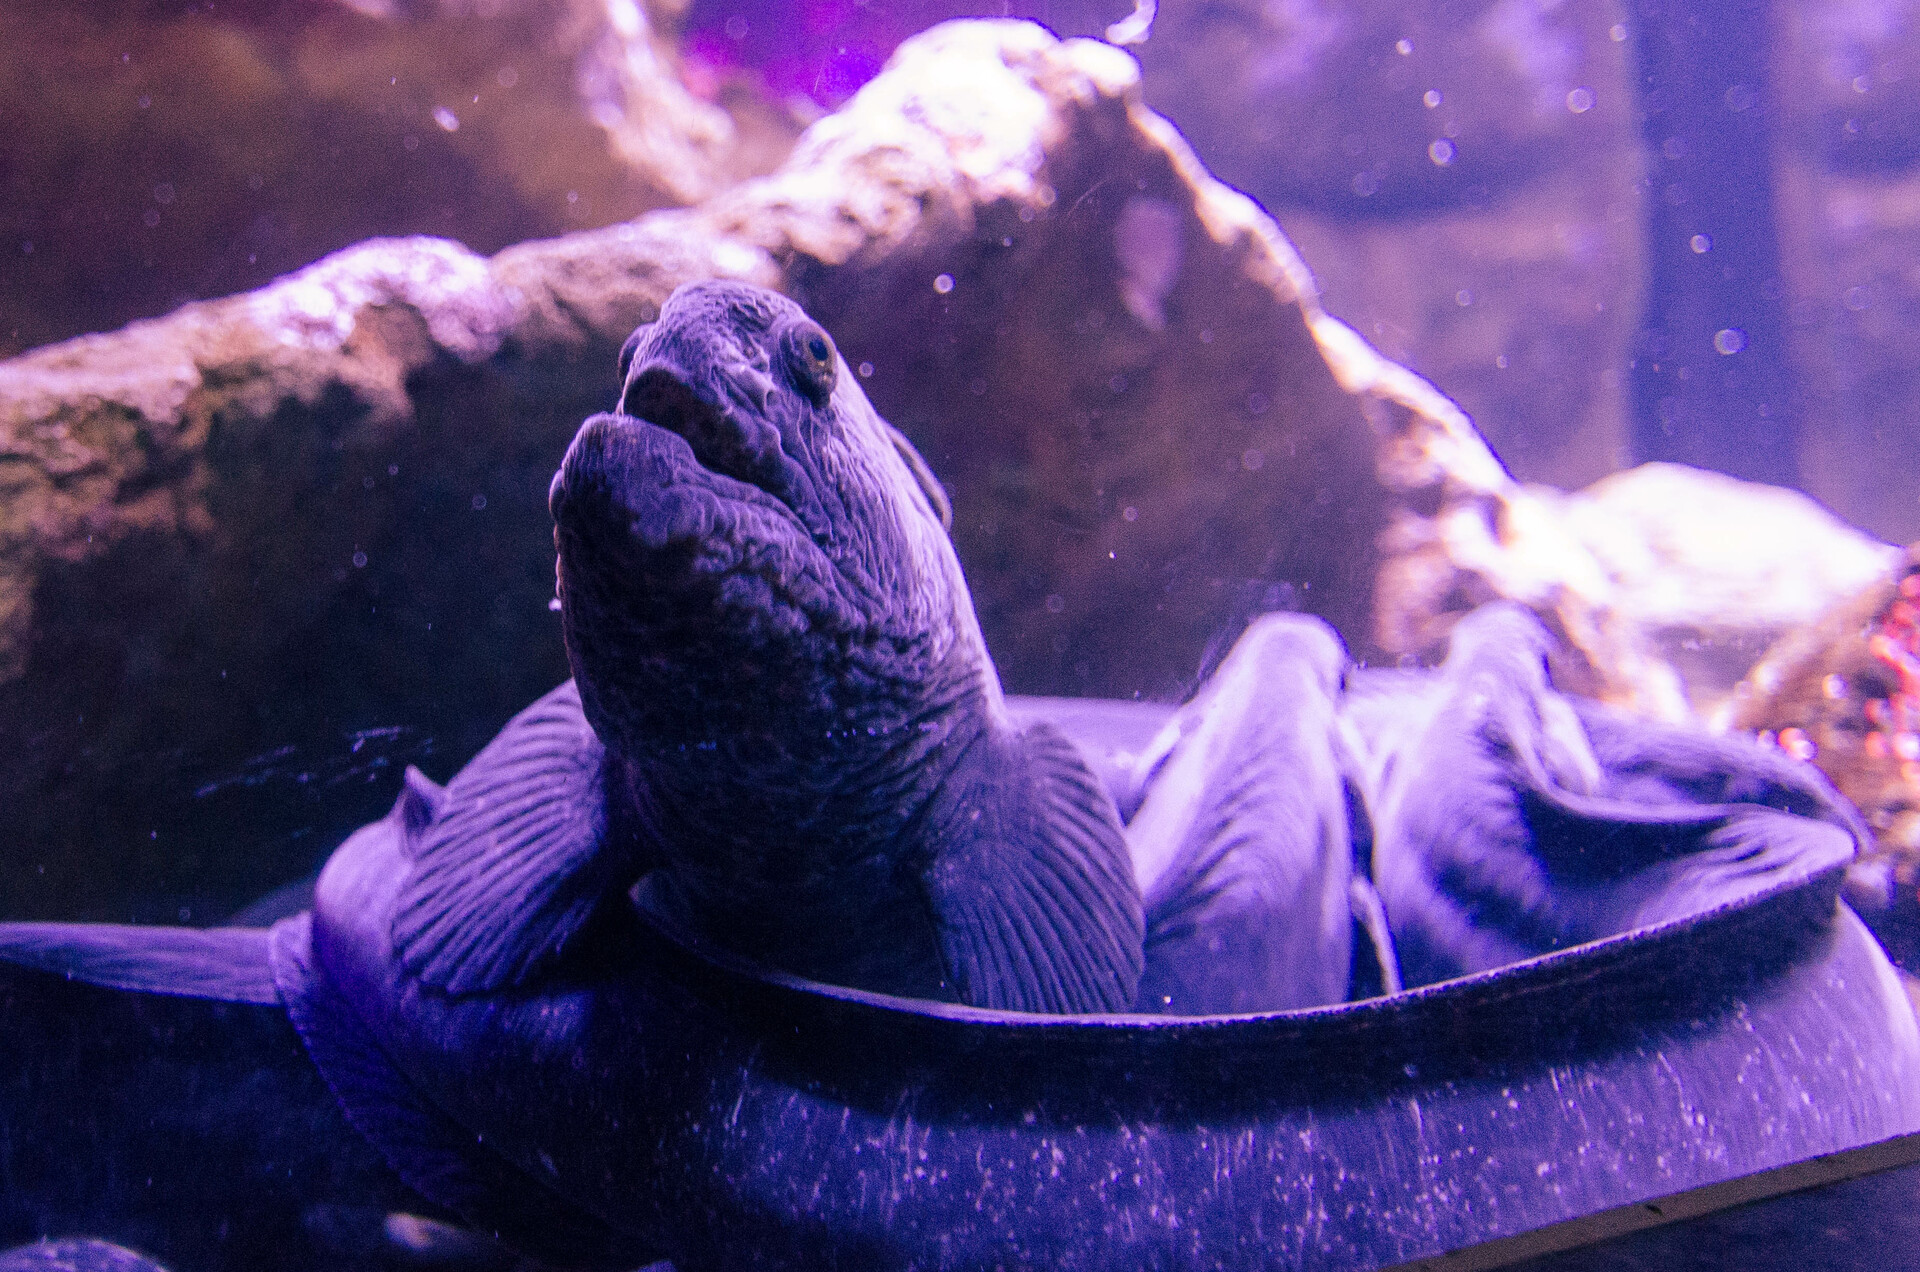 Mustafa kazmi aquarium march 109